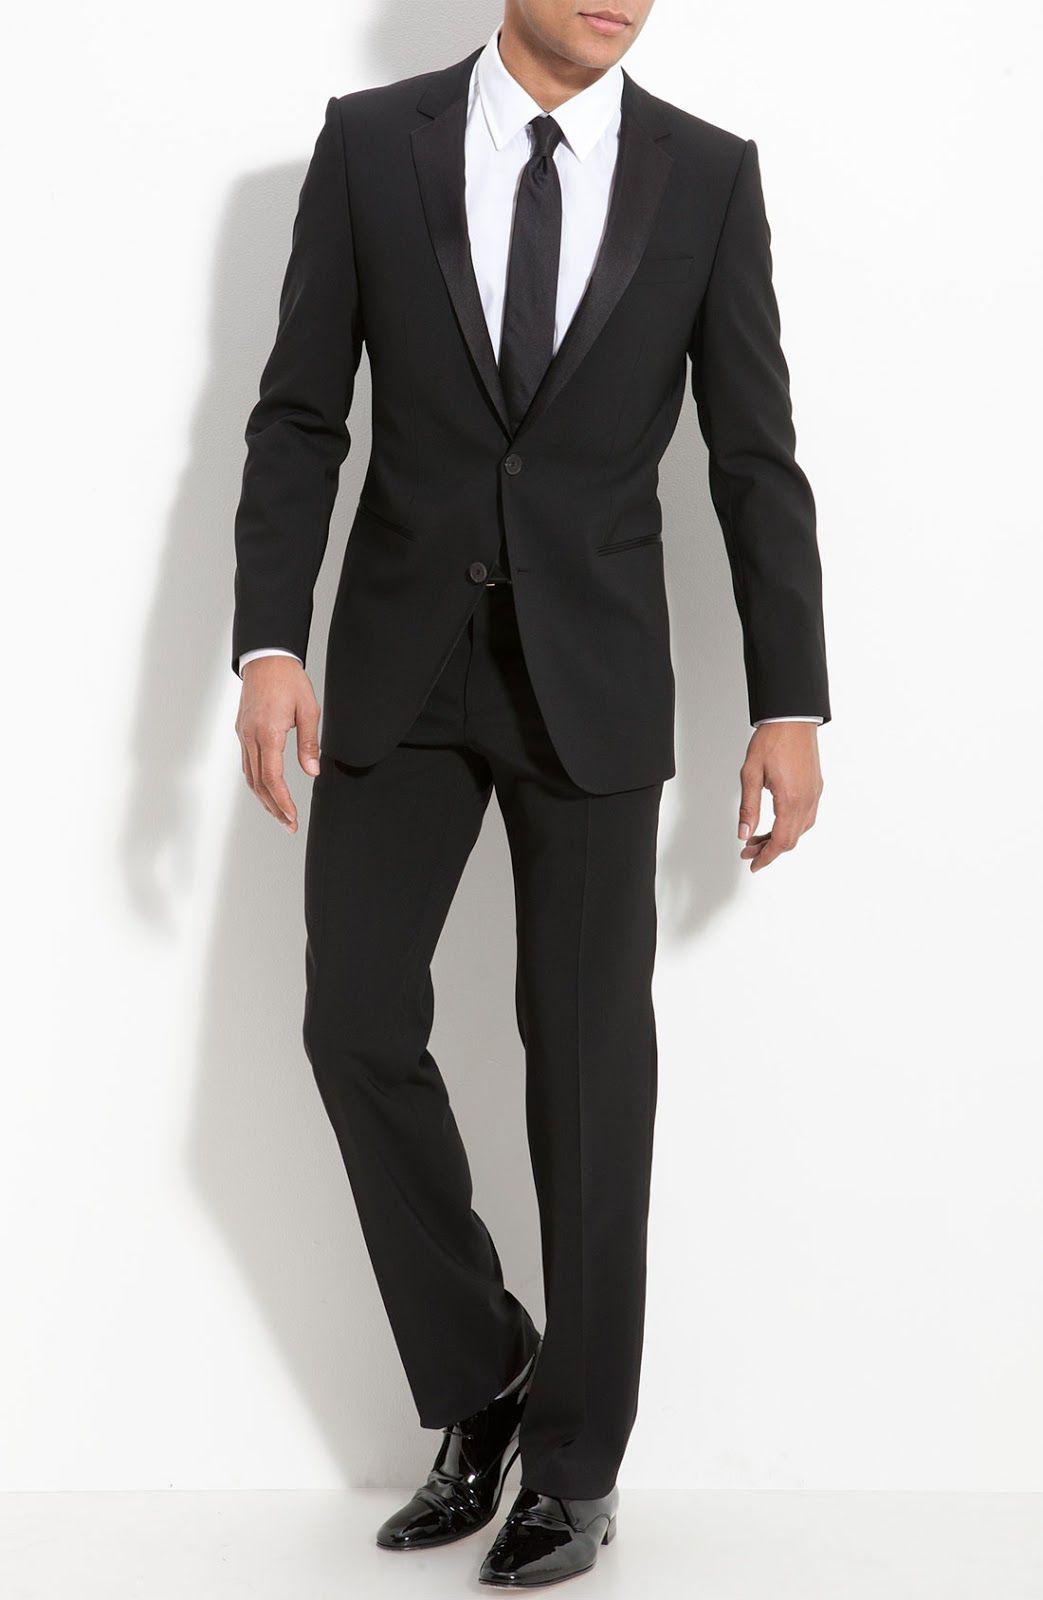 Simple black tux, slender black tie, no vest.